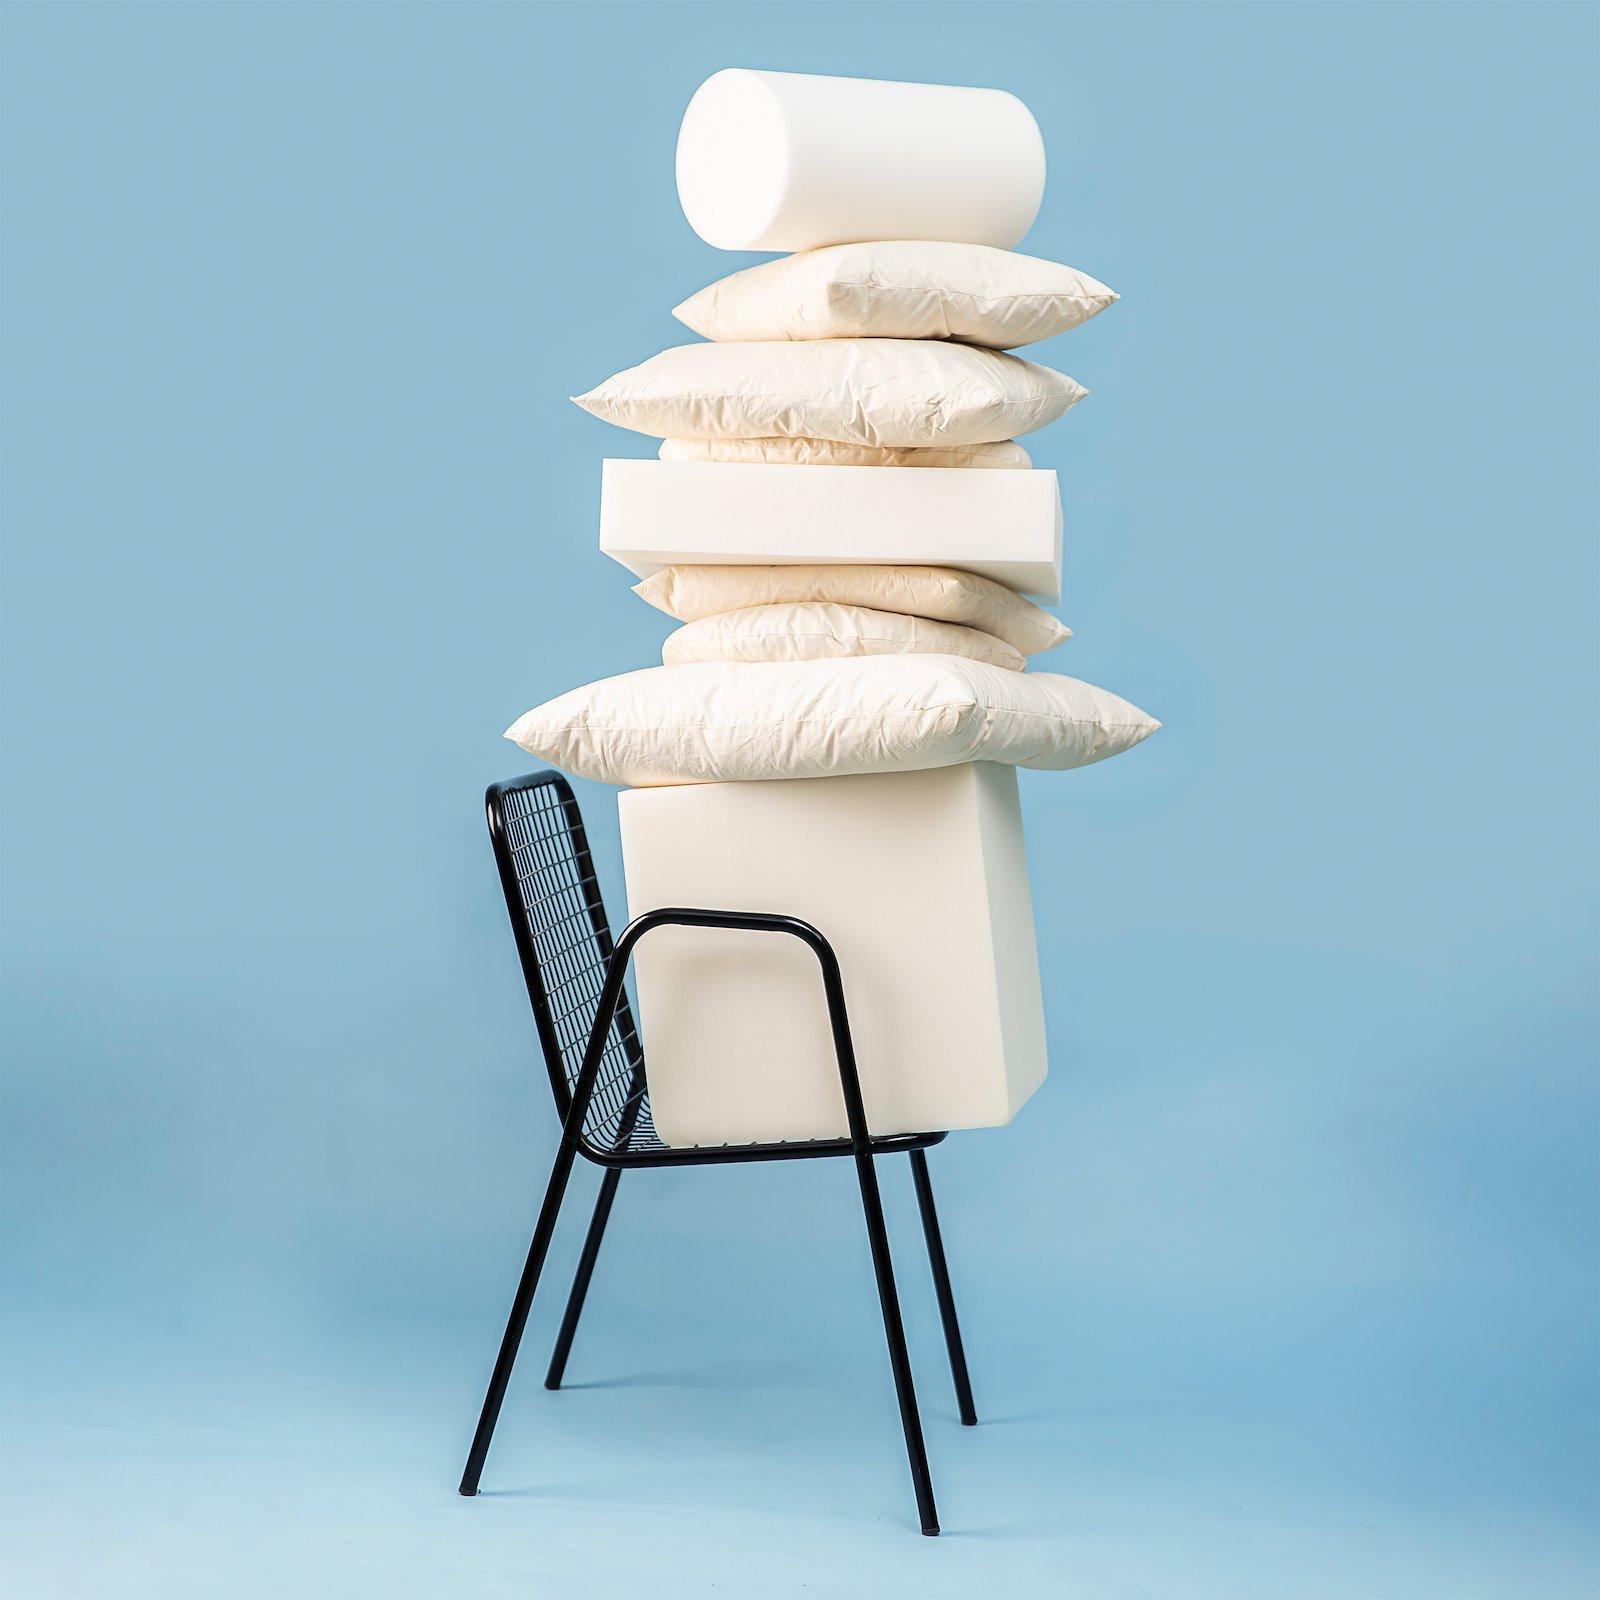 Cushion w/nature filling 60x35cm creme 38080061_38080002_38098050_38070048_38070045_38070061_38070050_38070060_bundle